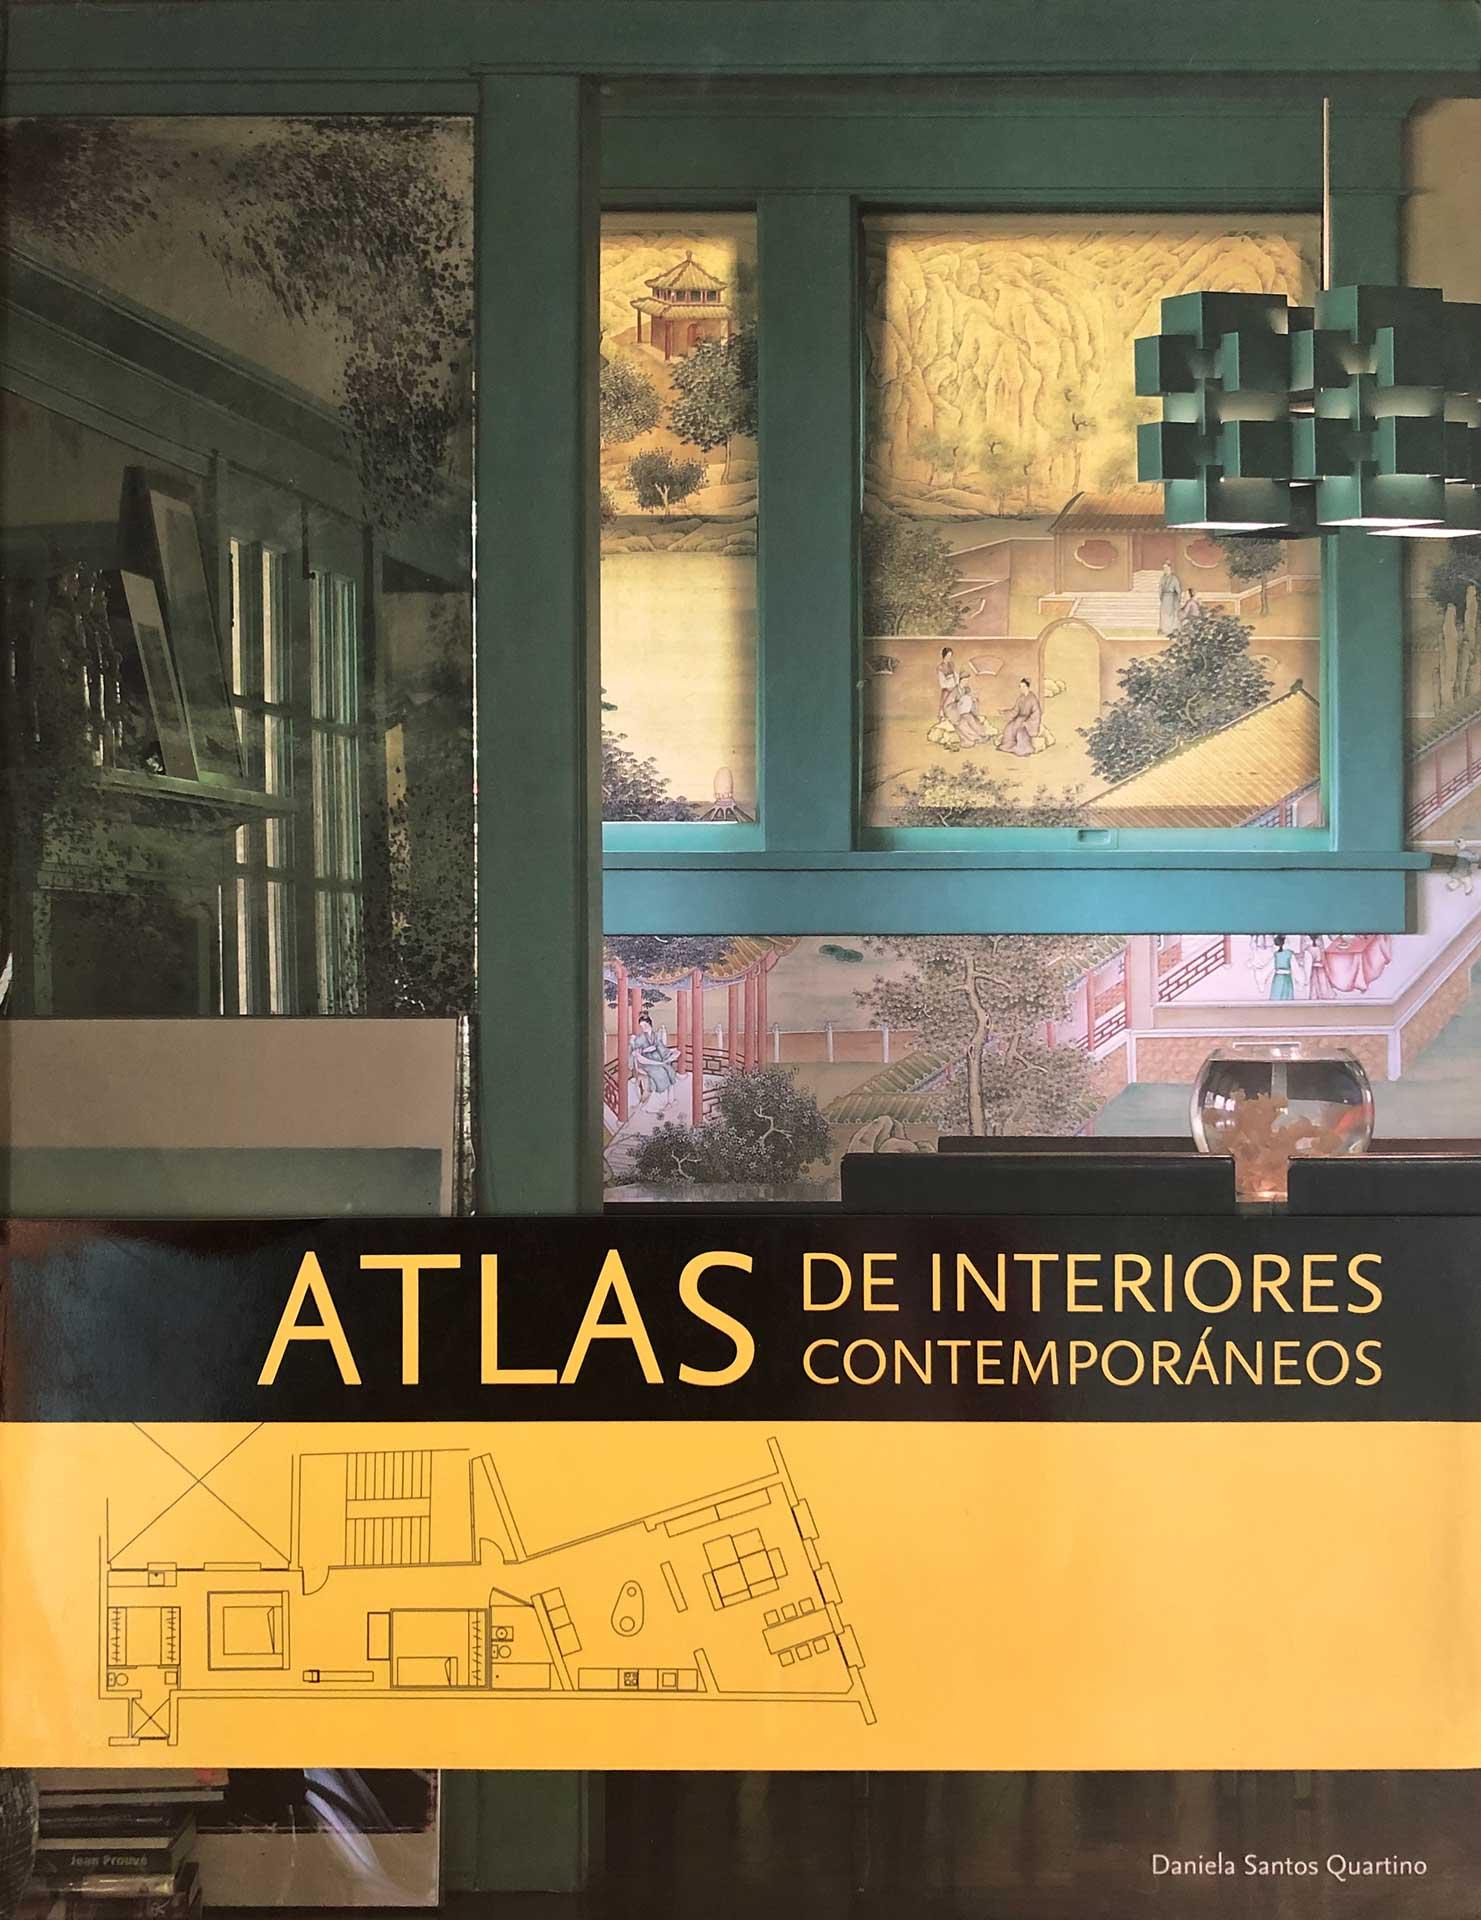 Sucursal Urbana en libros monográficos sobre arquitecturaSucursal Urbana en libros monográficos sobre arquitectura